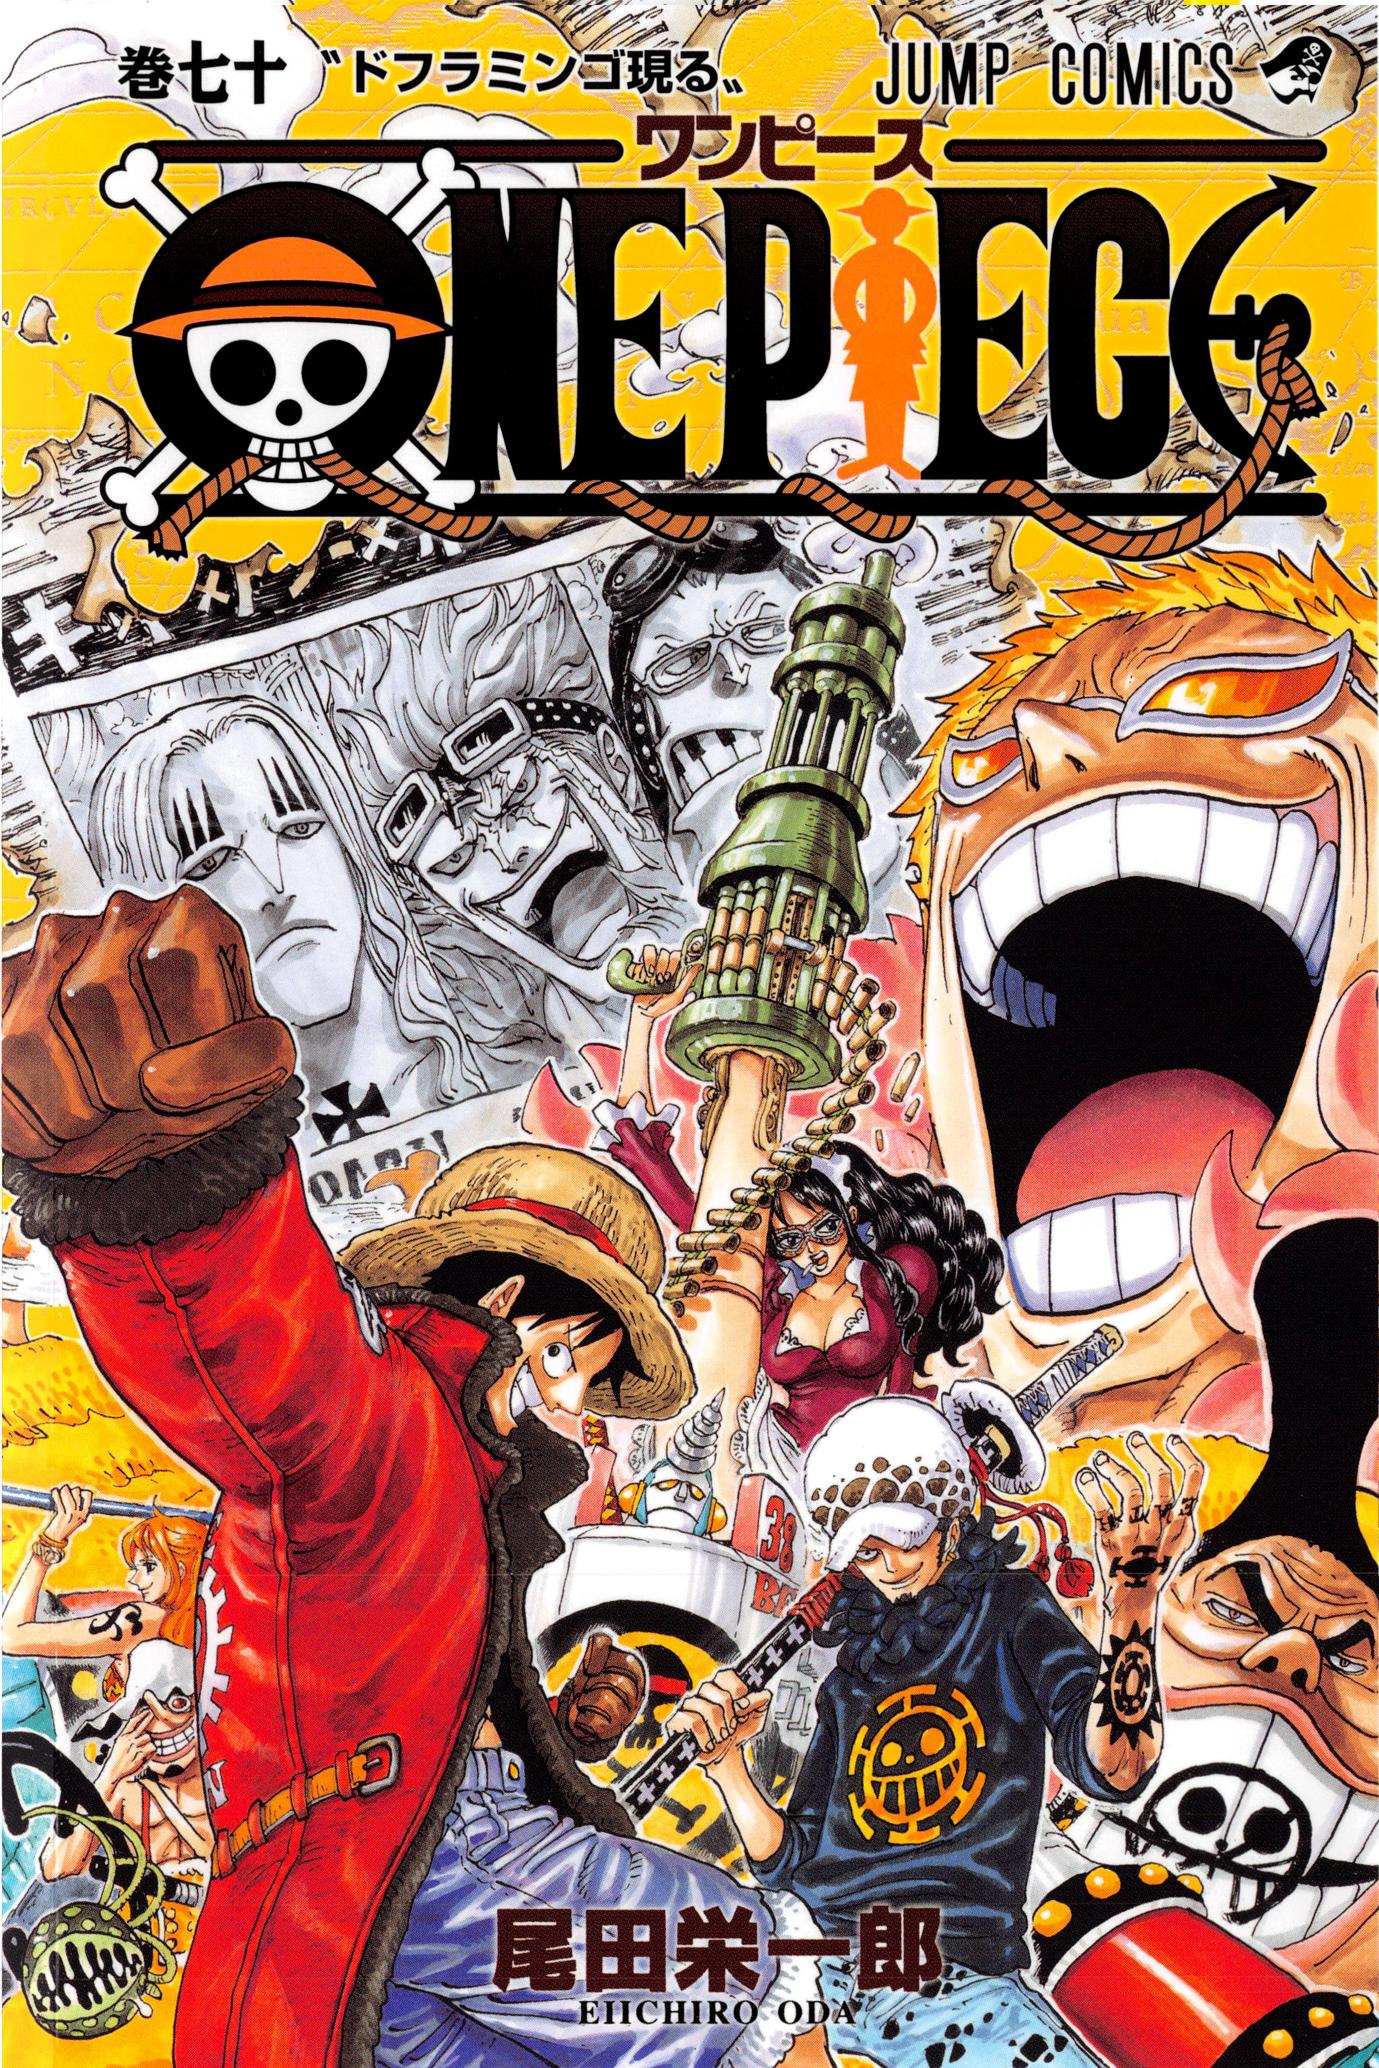 The 25 Most Anticipated Manga Ending Haruhichan.com One Piece manga cover